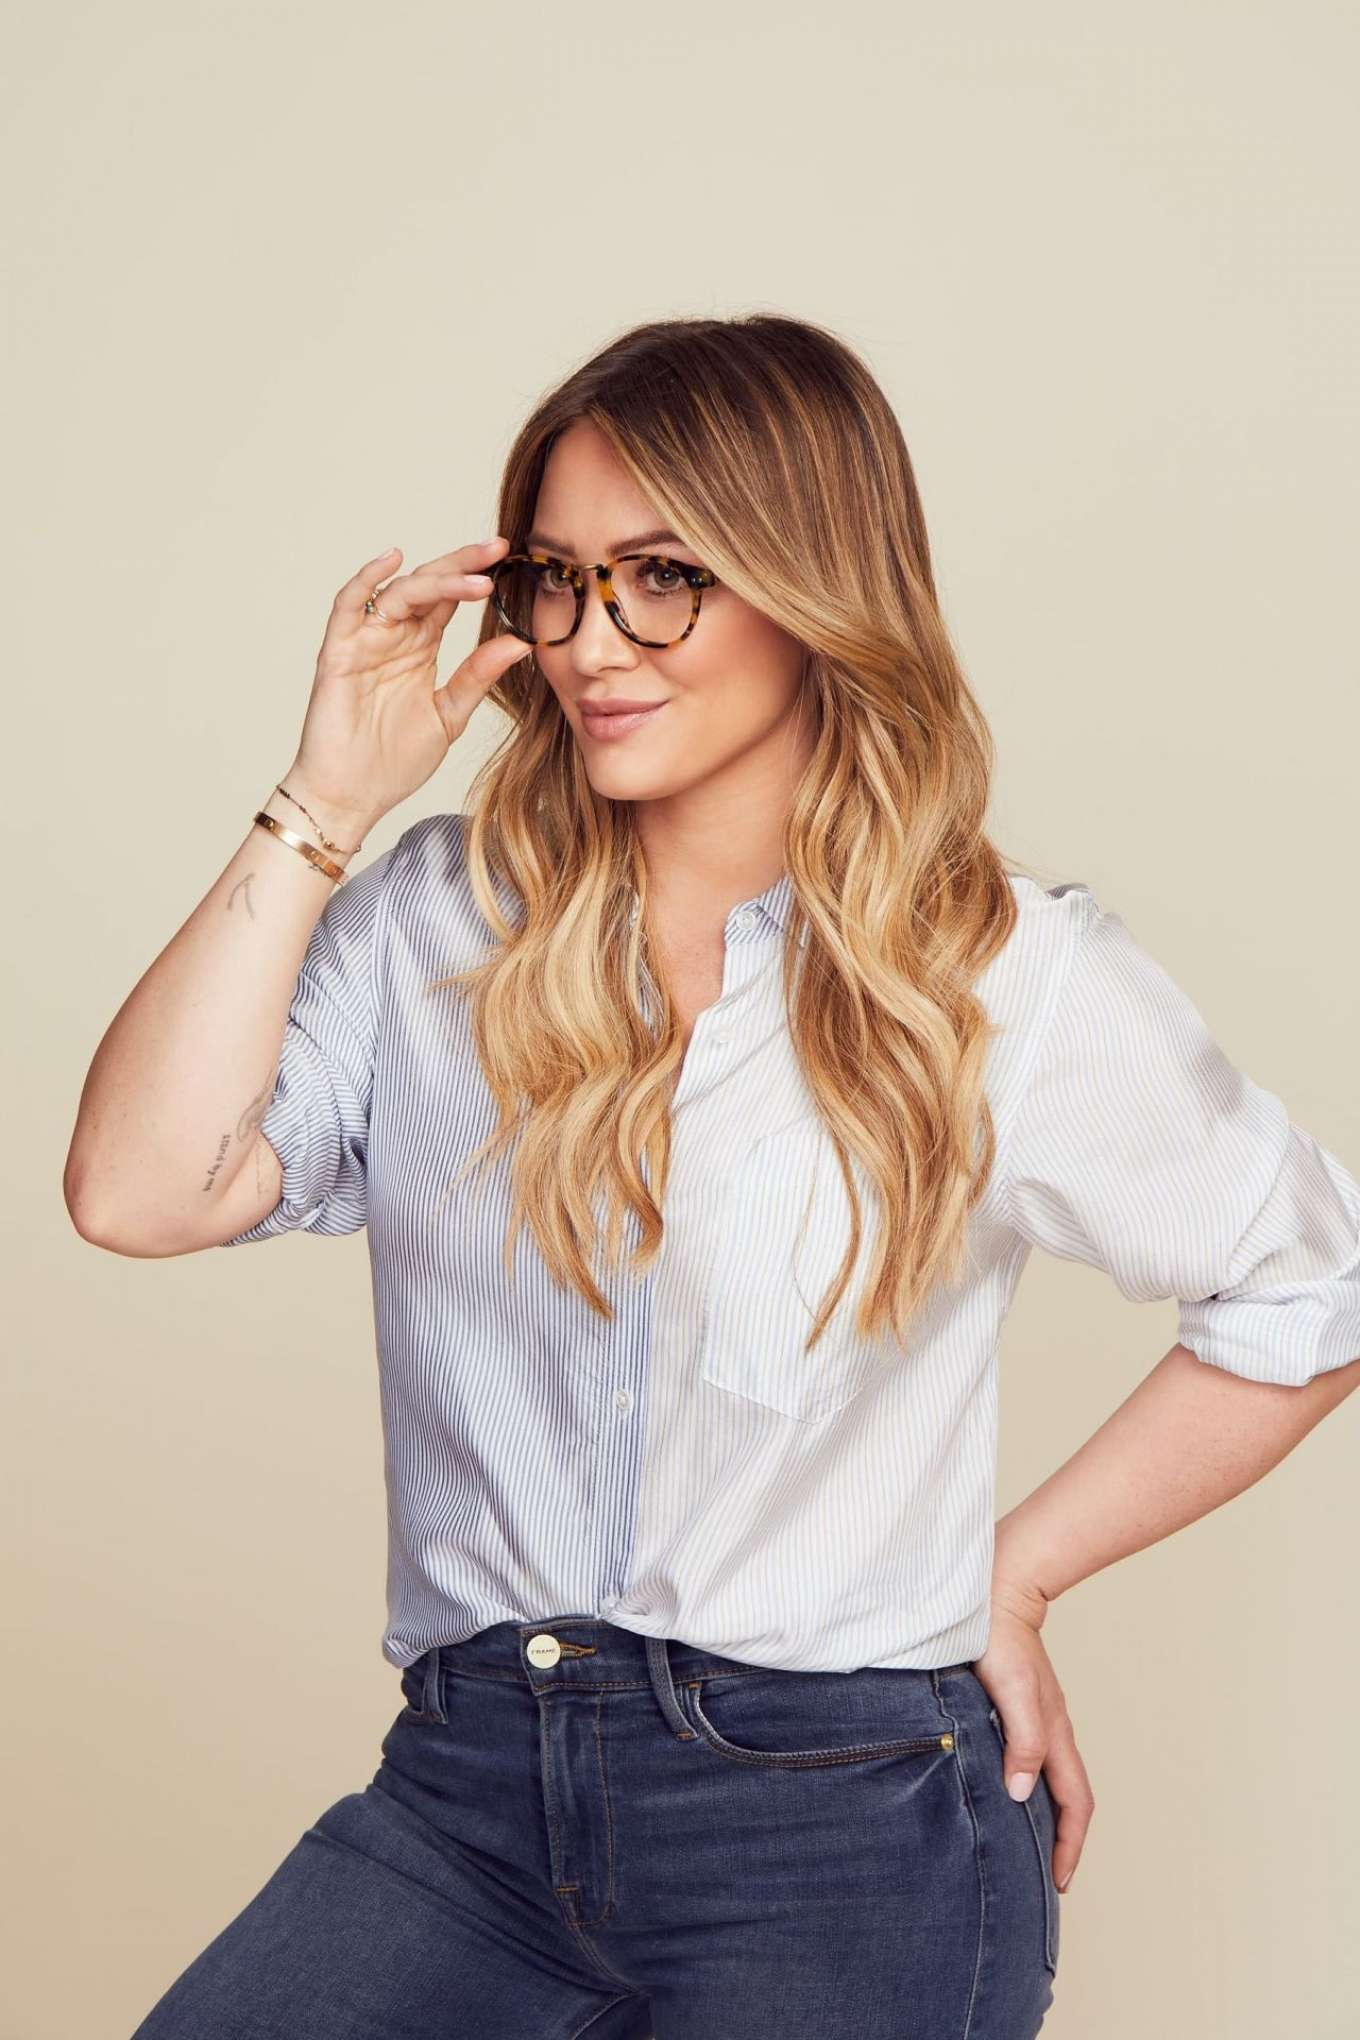 Hilary Duff - 'Muse x Hilary Duff' Eyewear Collection (November 2019)